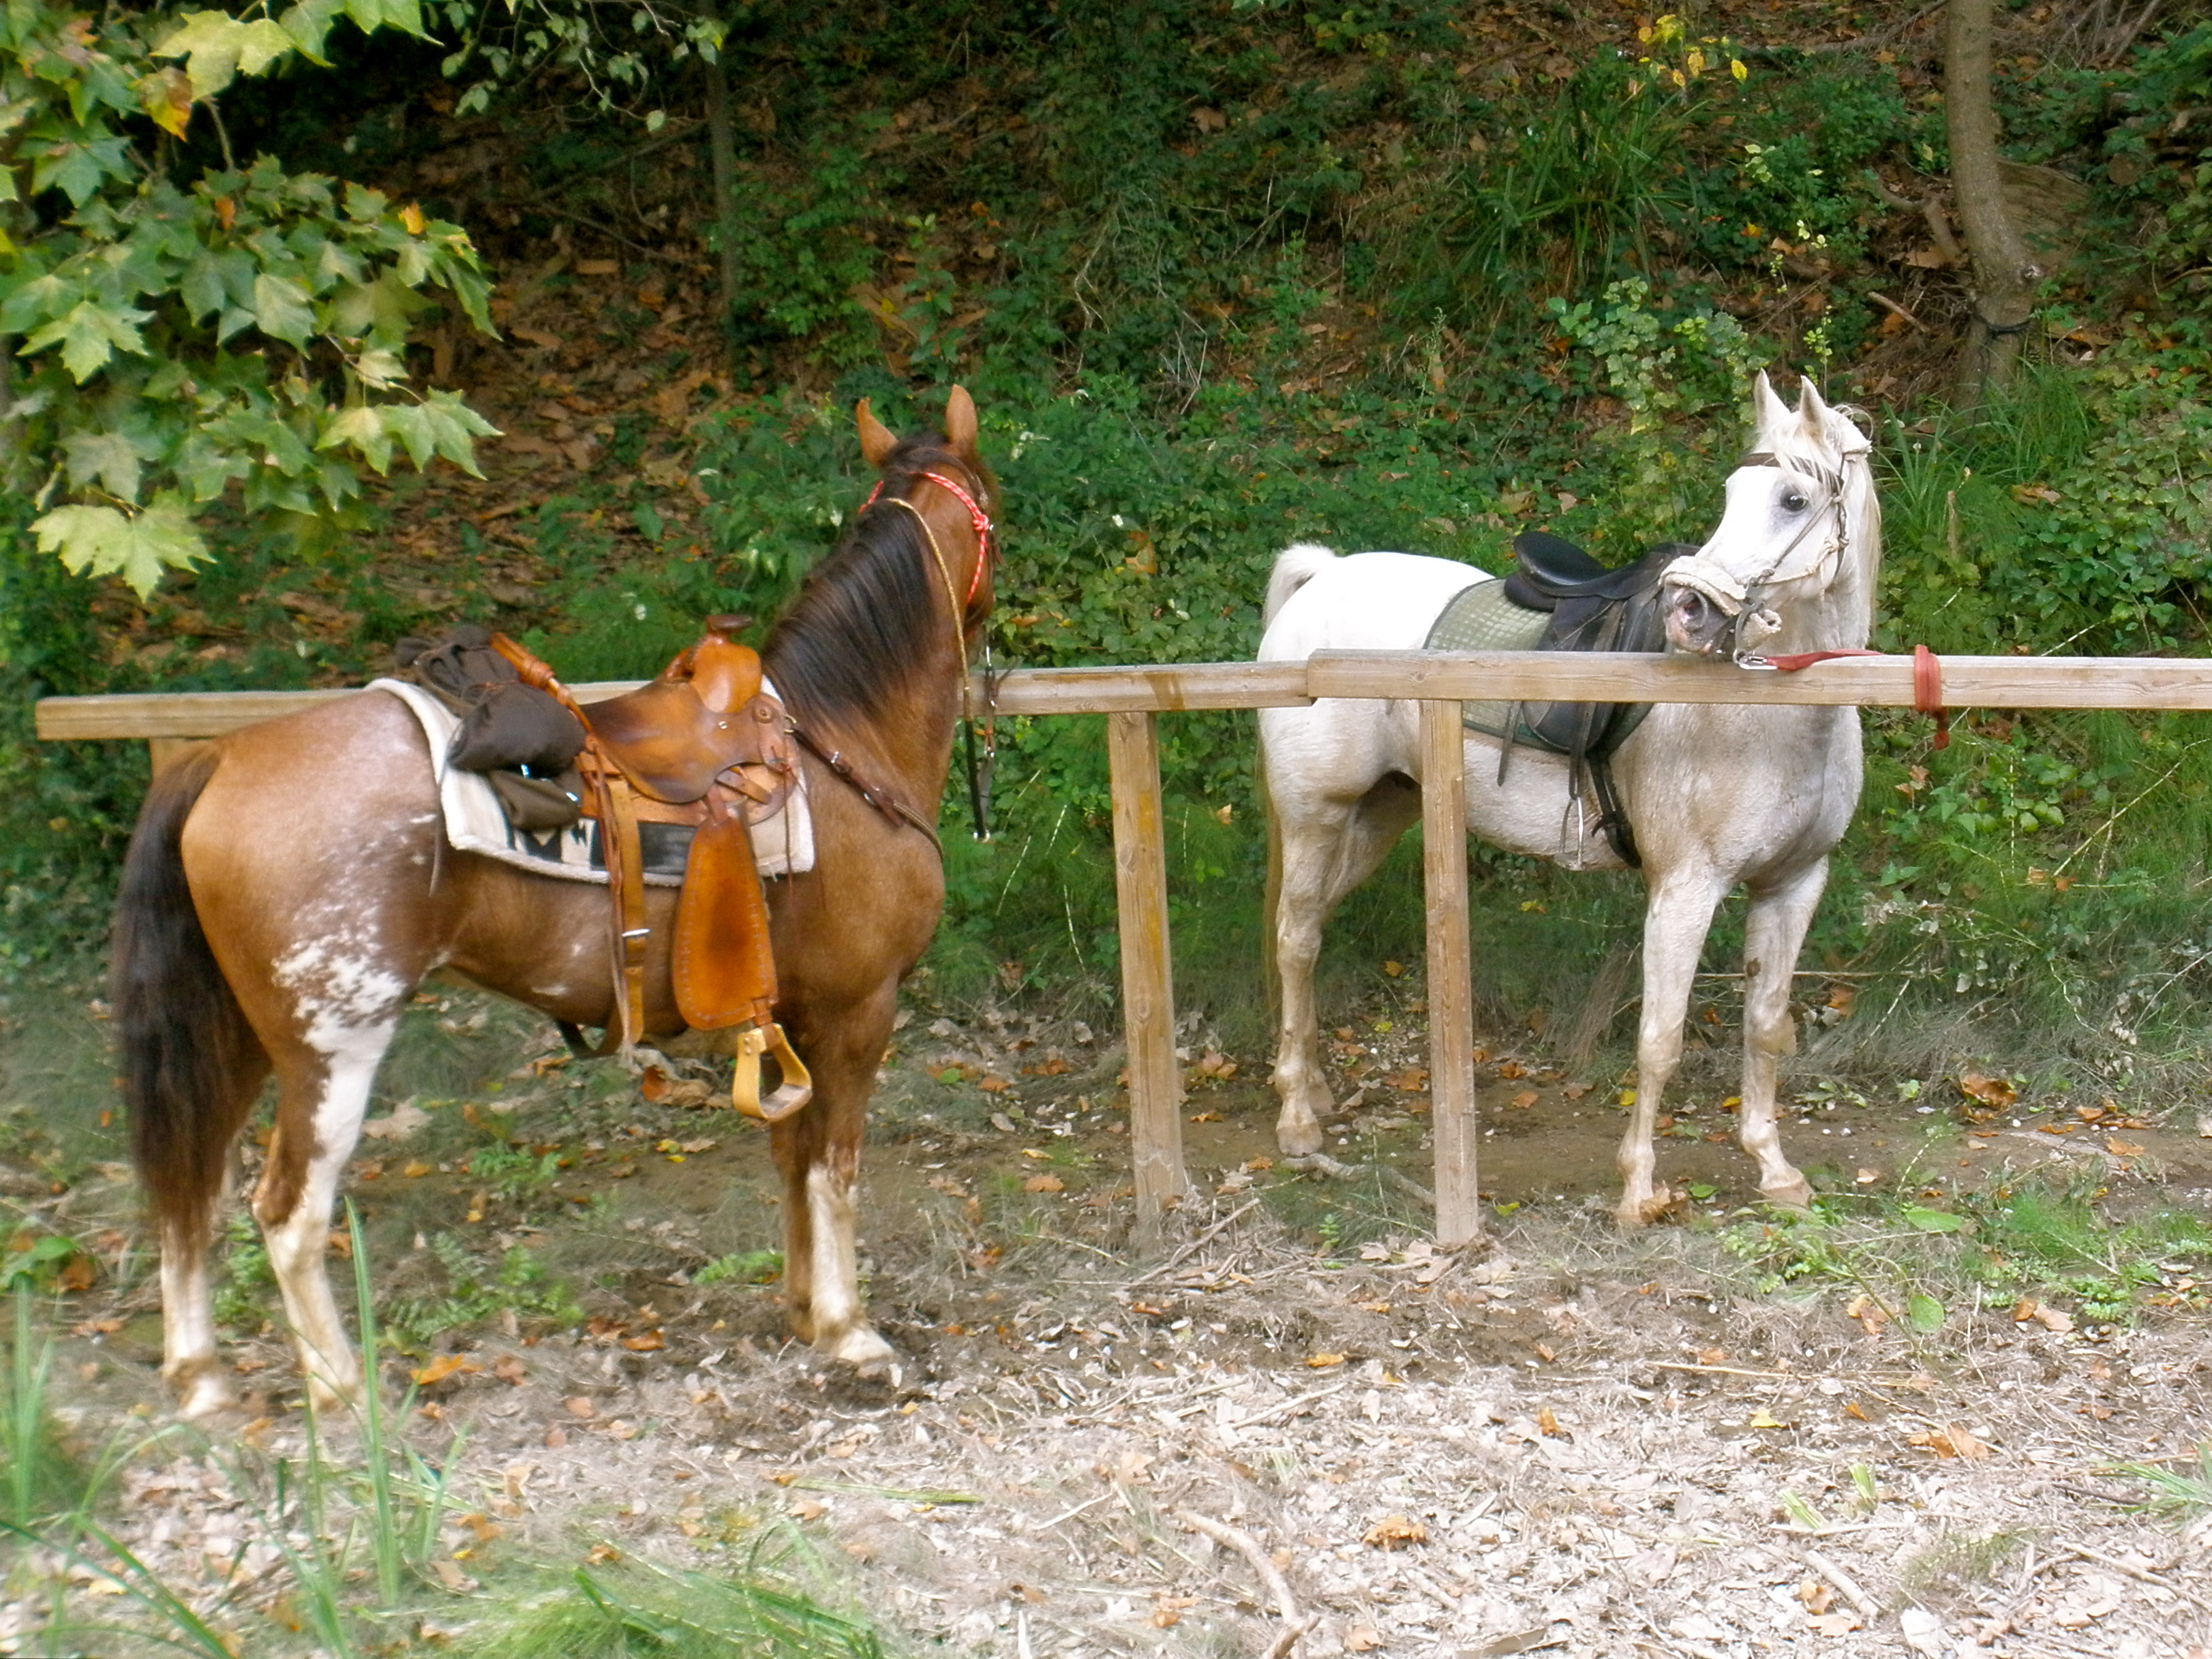 Two little cuties, American, Animal, Arabian, Horse, HQ Photo